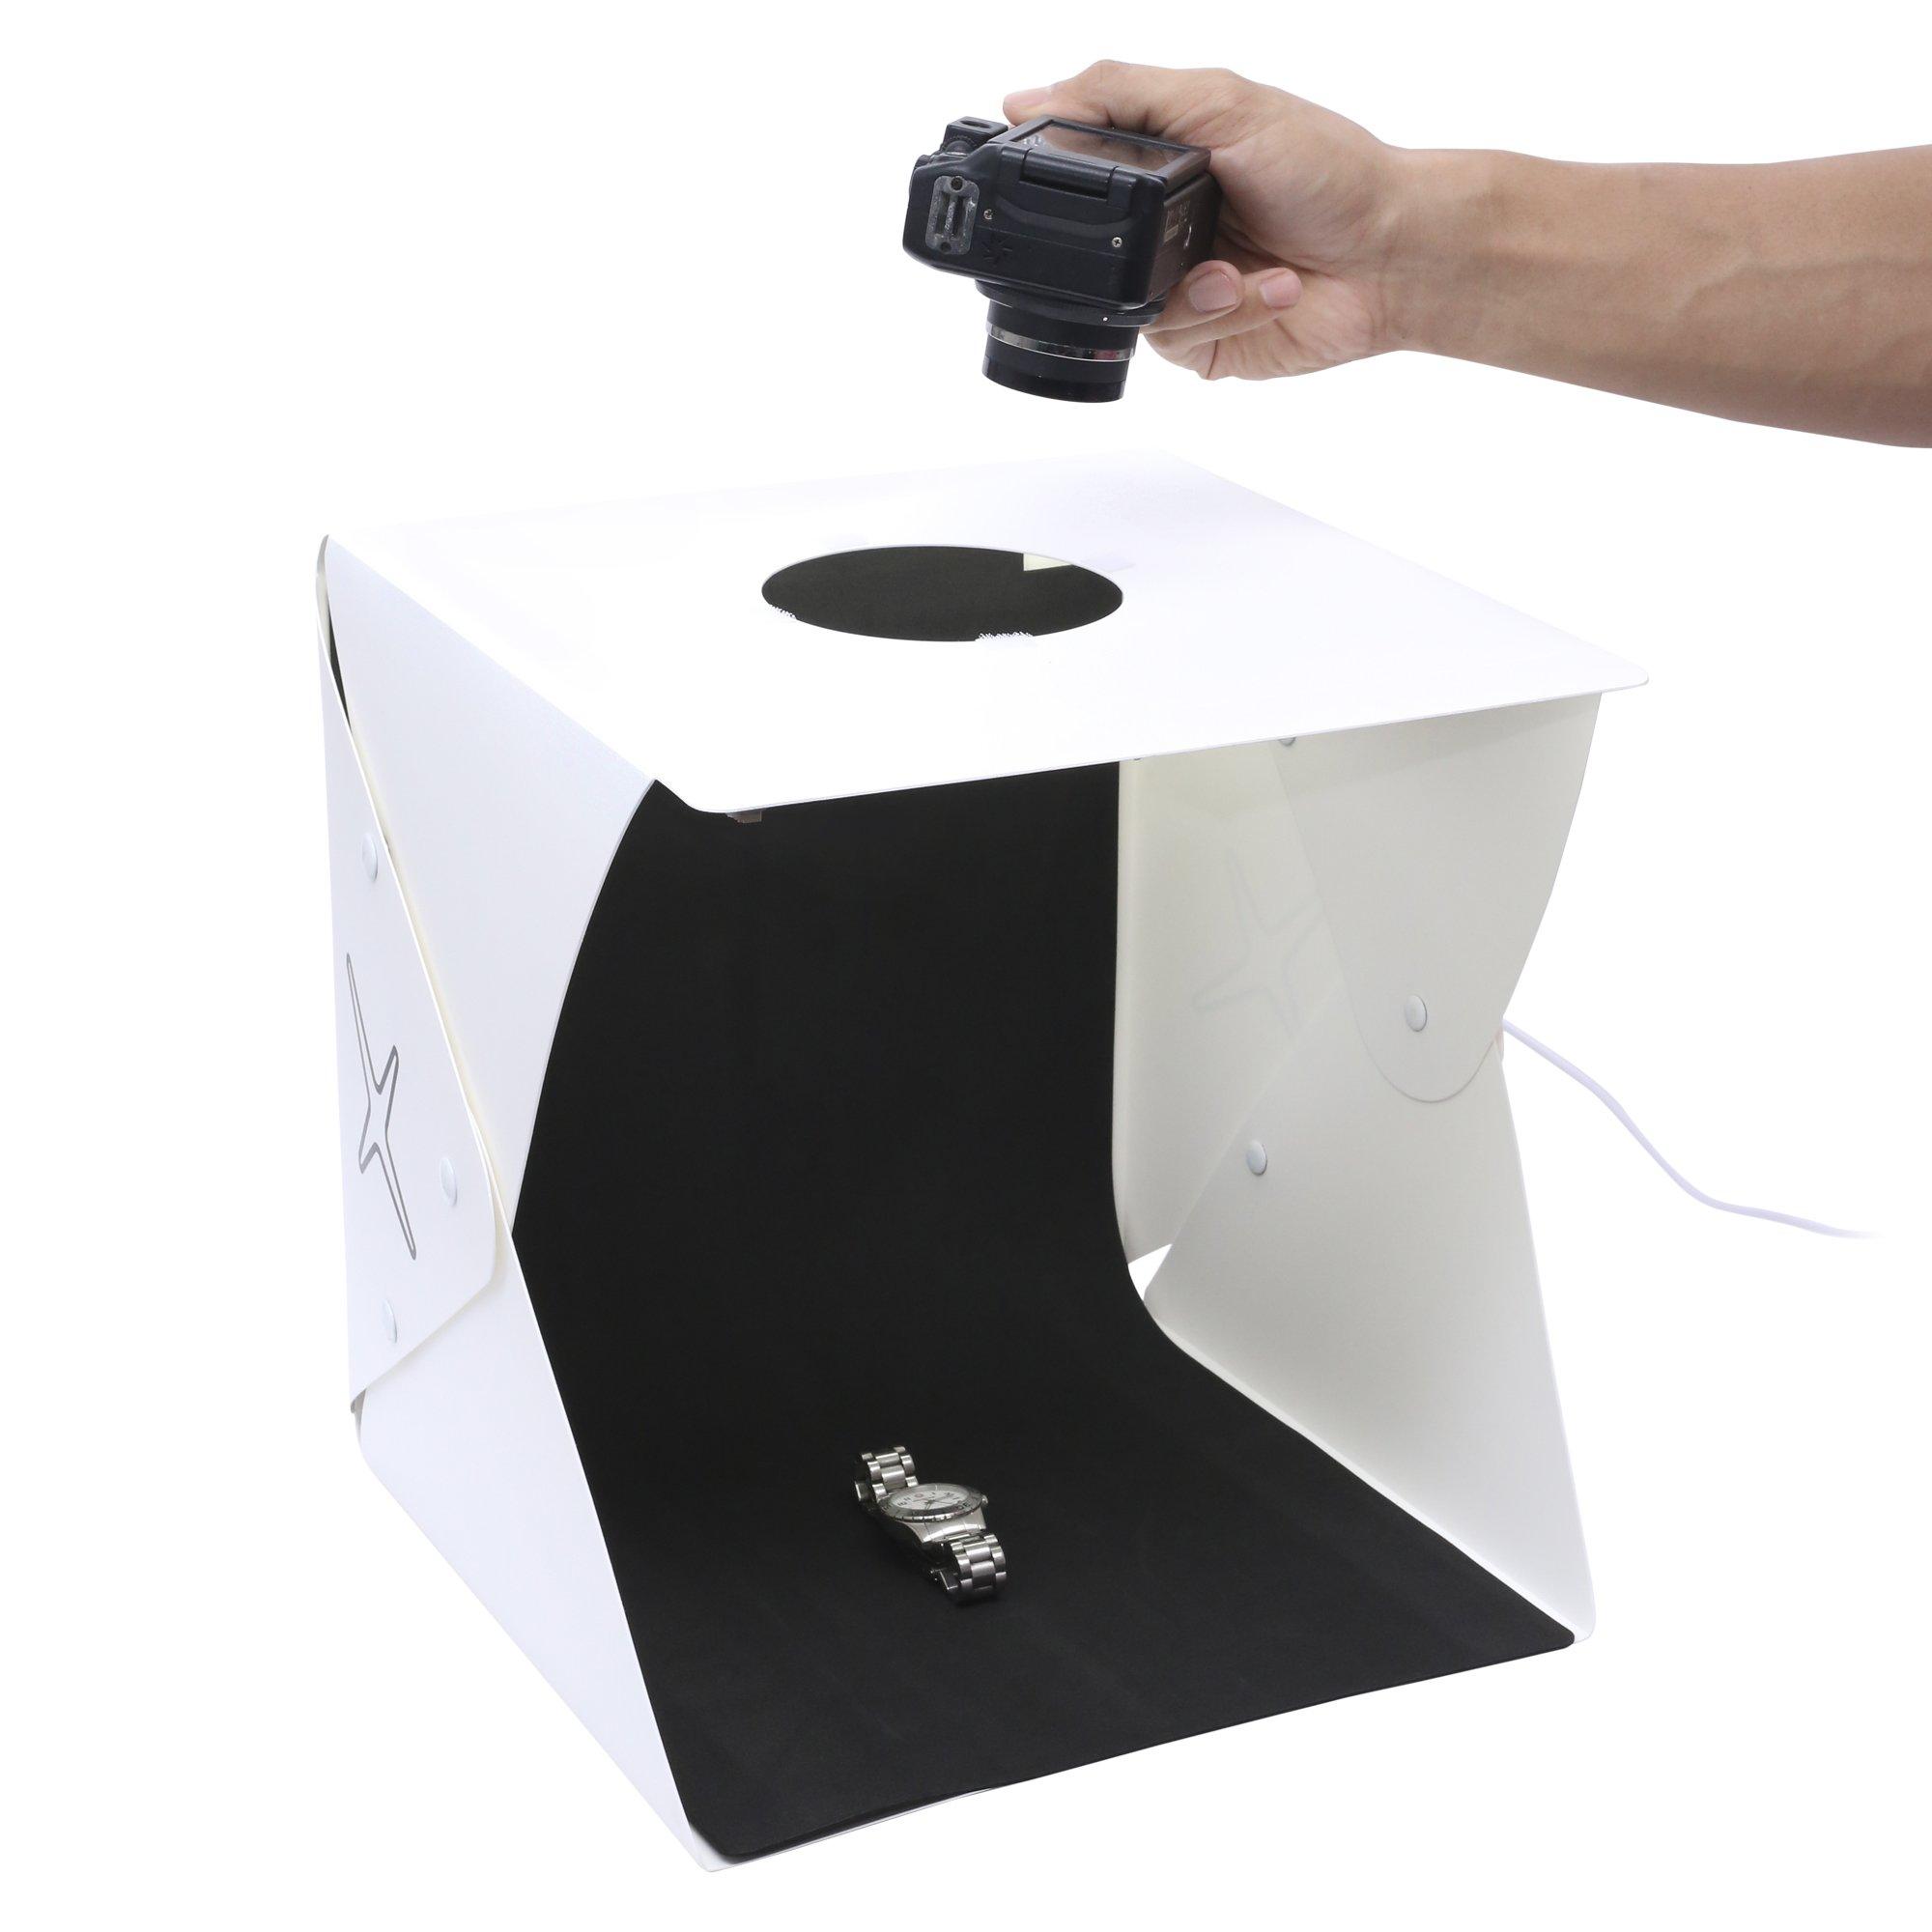 Capture Portable Photo Studio Box: LED Light Box Photo Tent- Large by Capture (Image #7)